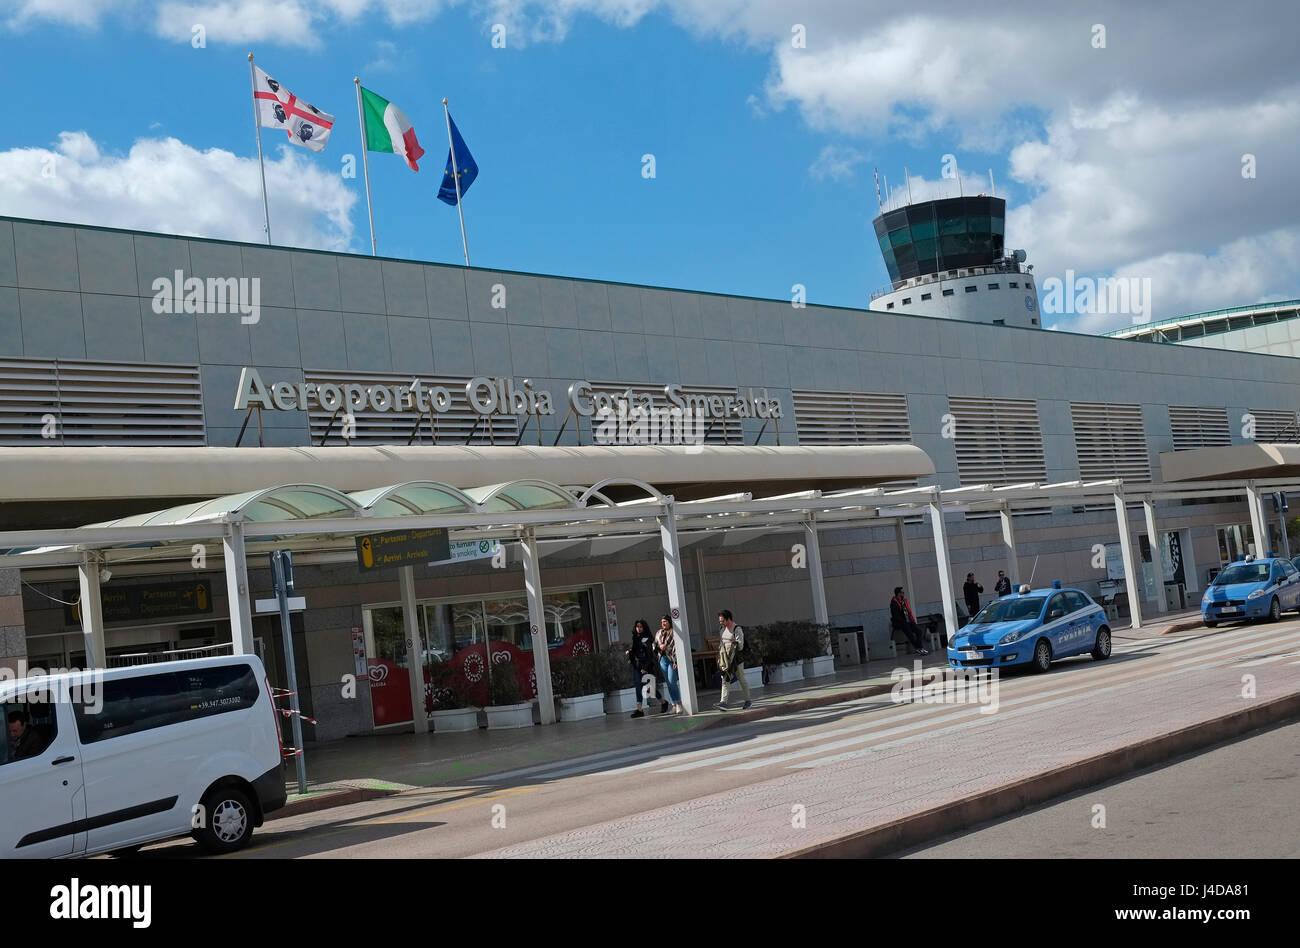 olbia airport, sardinia, italy - Stock Image